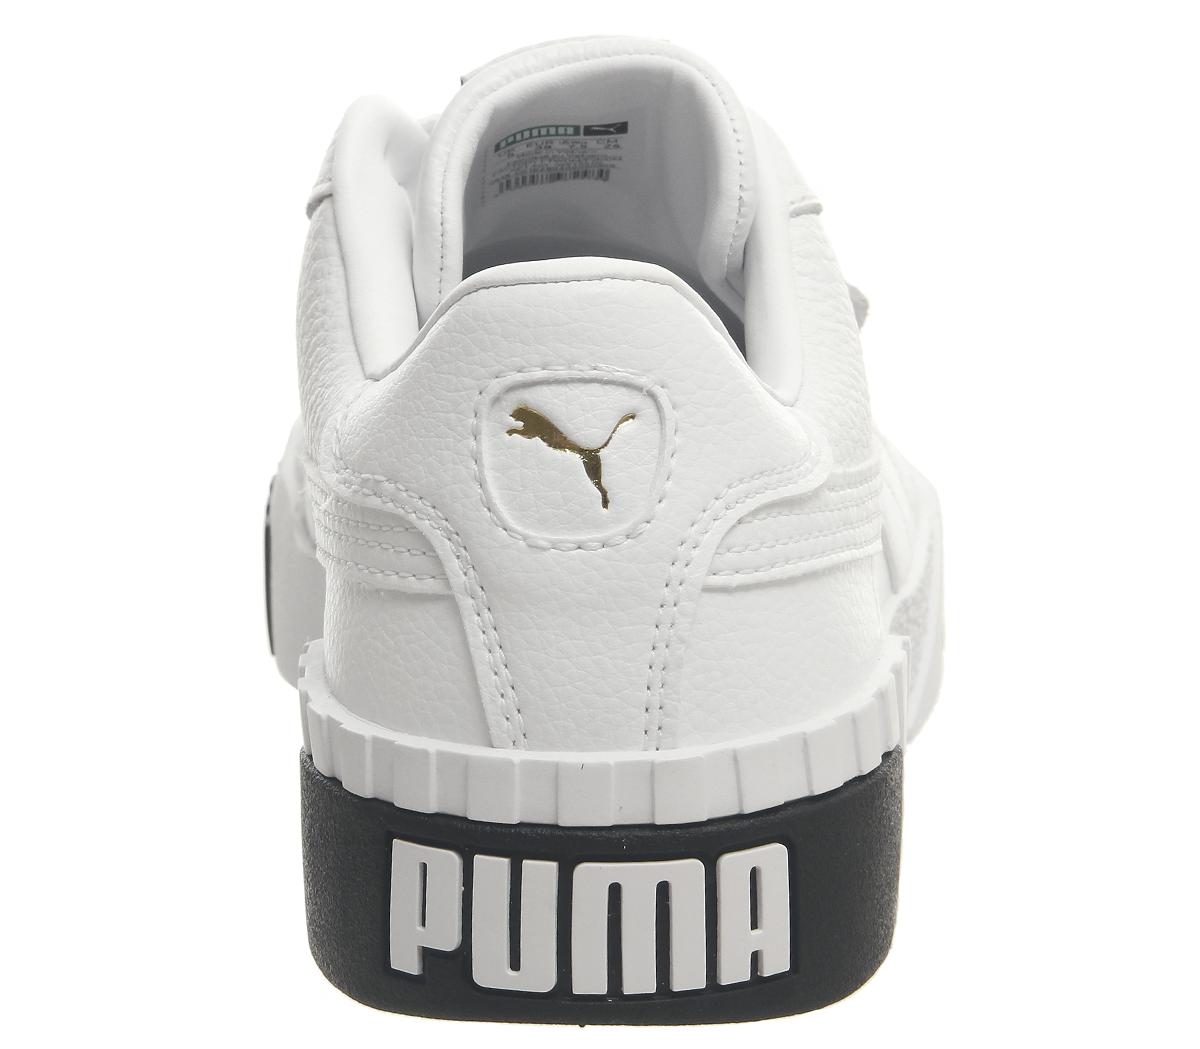 Womens Puma Puma Puma Cali Trainers Puma White Black Trainers shoes 3c7654